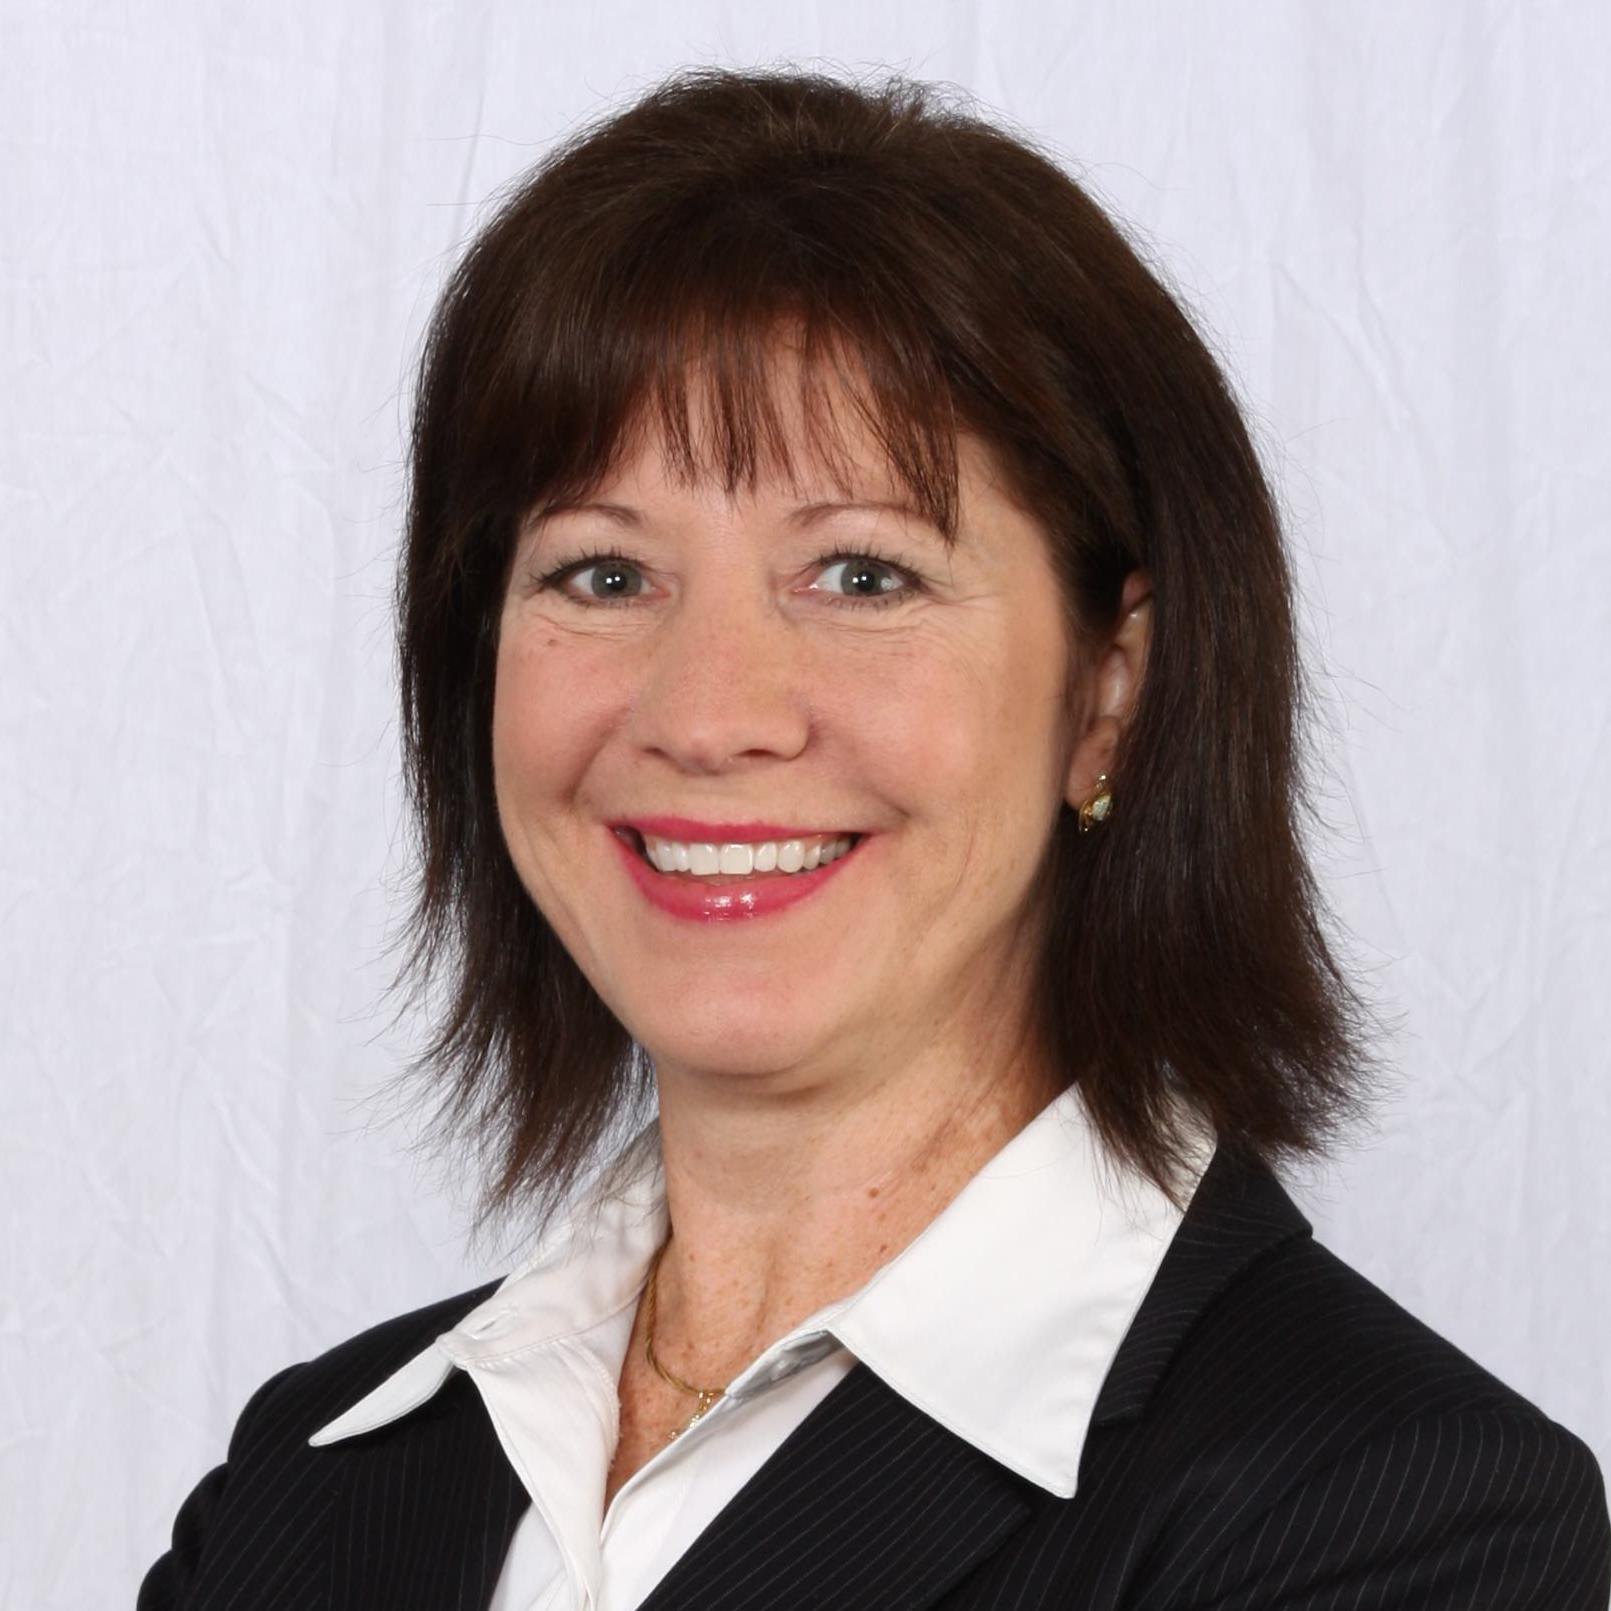 Headshot photo of Kathy Matzka, CPMSM, CPCS